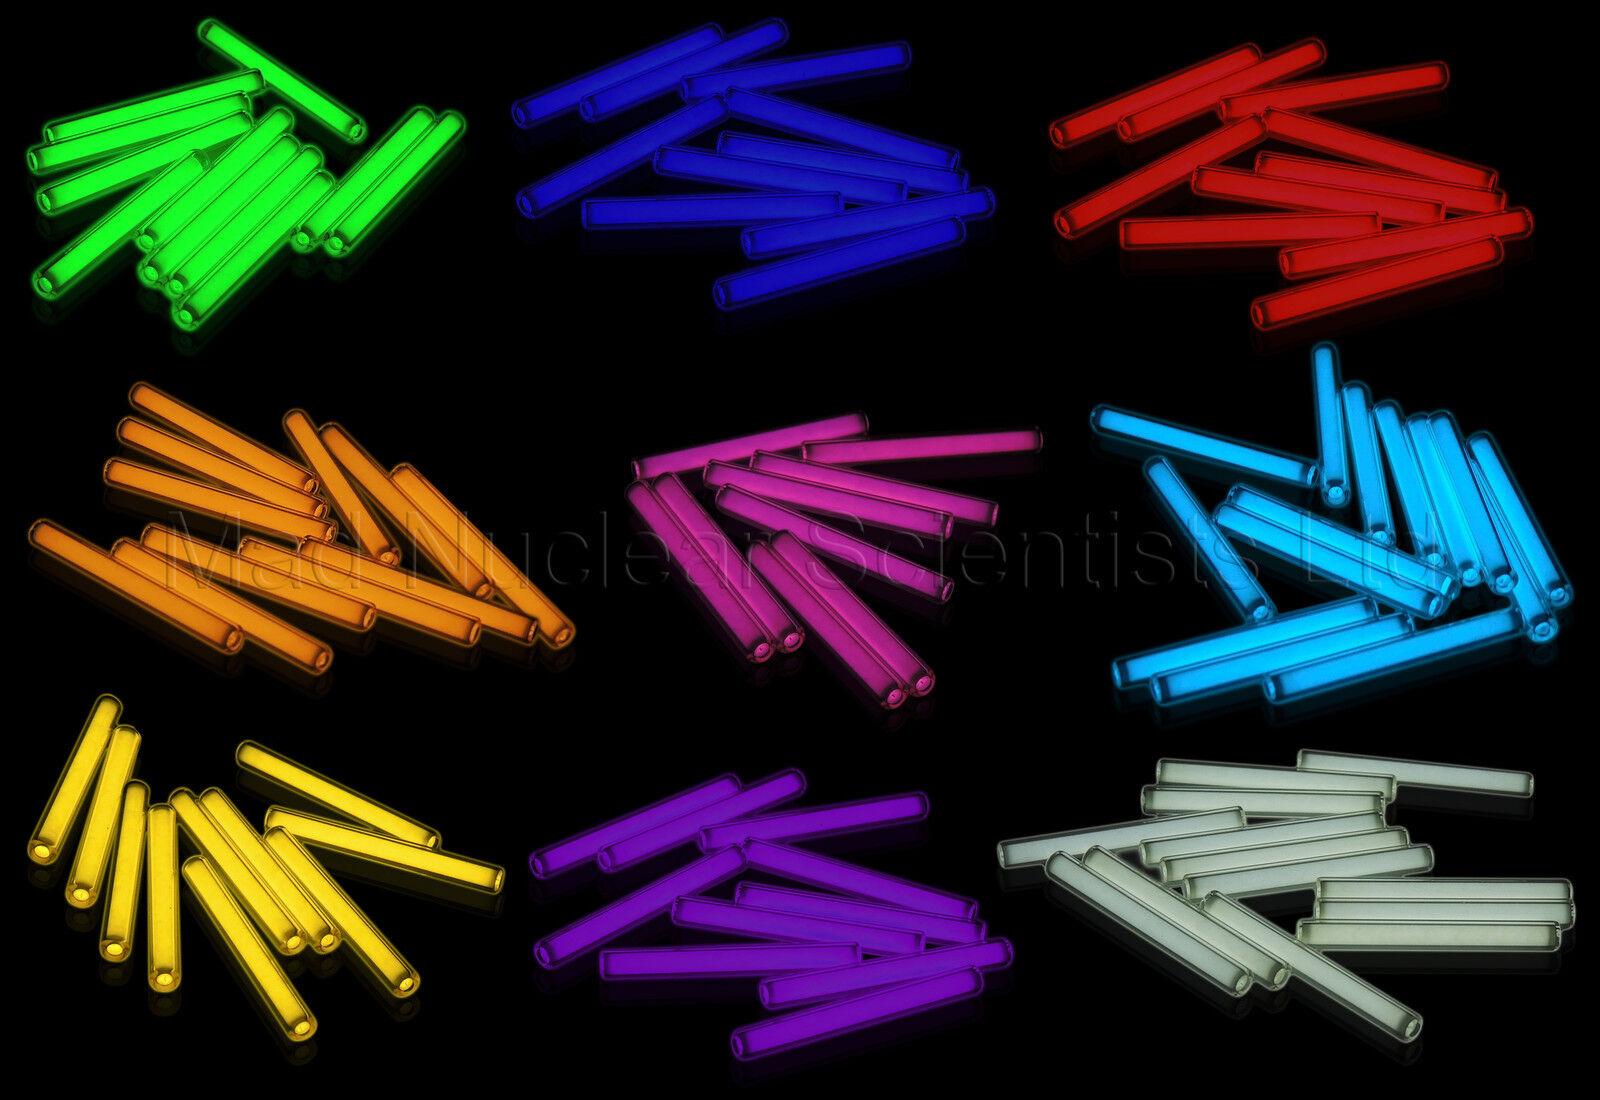 Tritium Lamp, Vial, Tube, Capsule, Trigalight - 11mm x 3 mm - Glow in the Dark